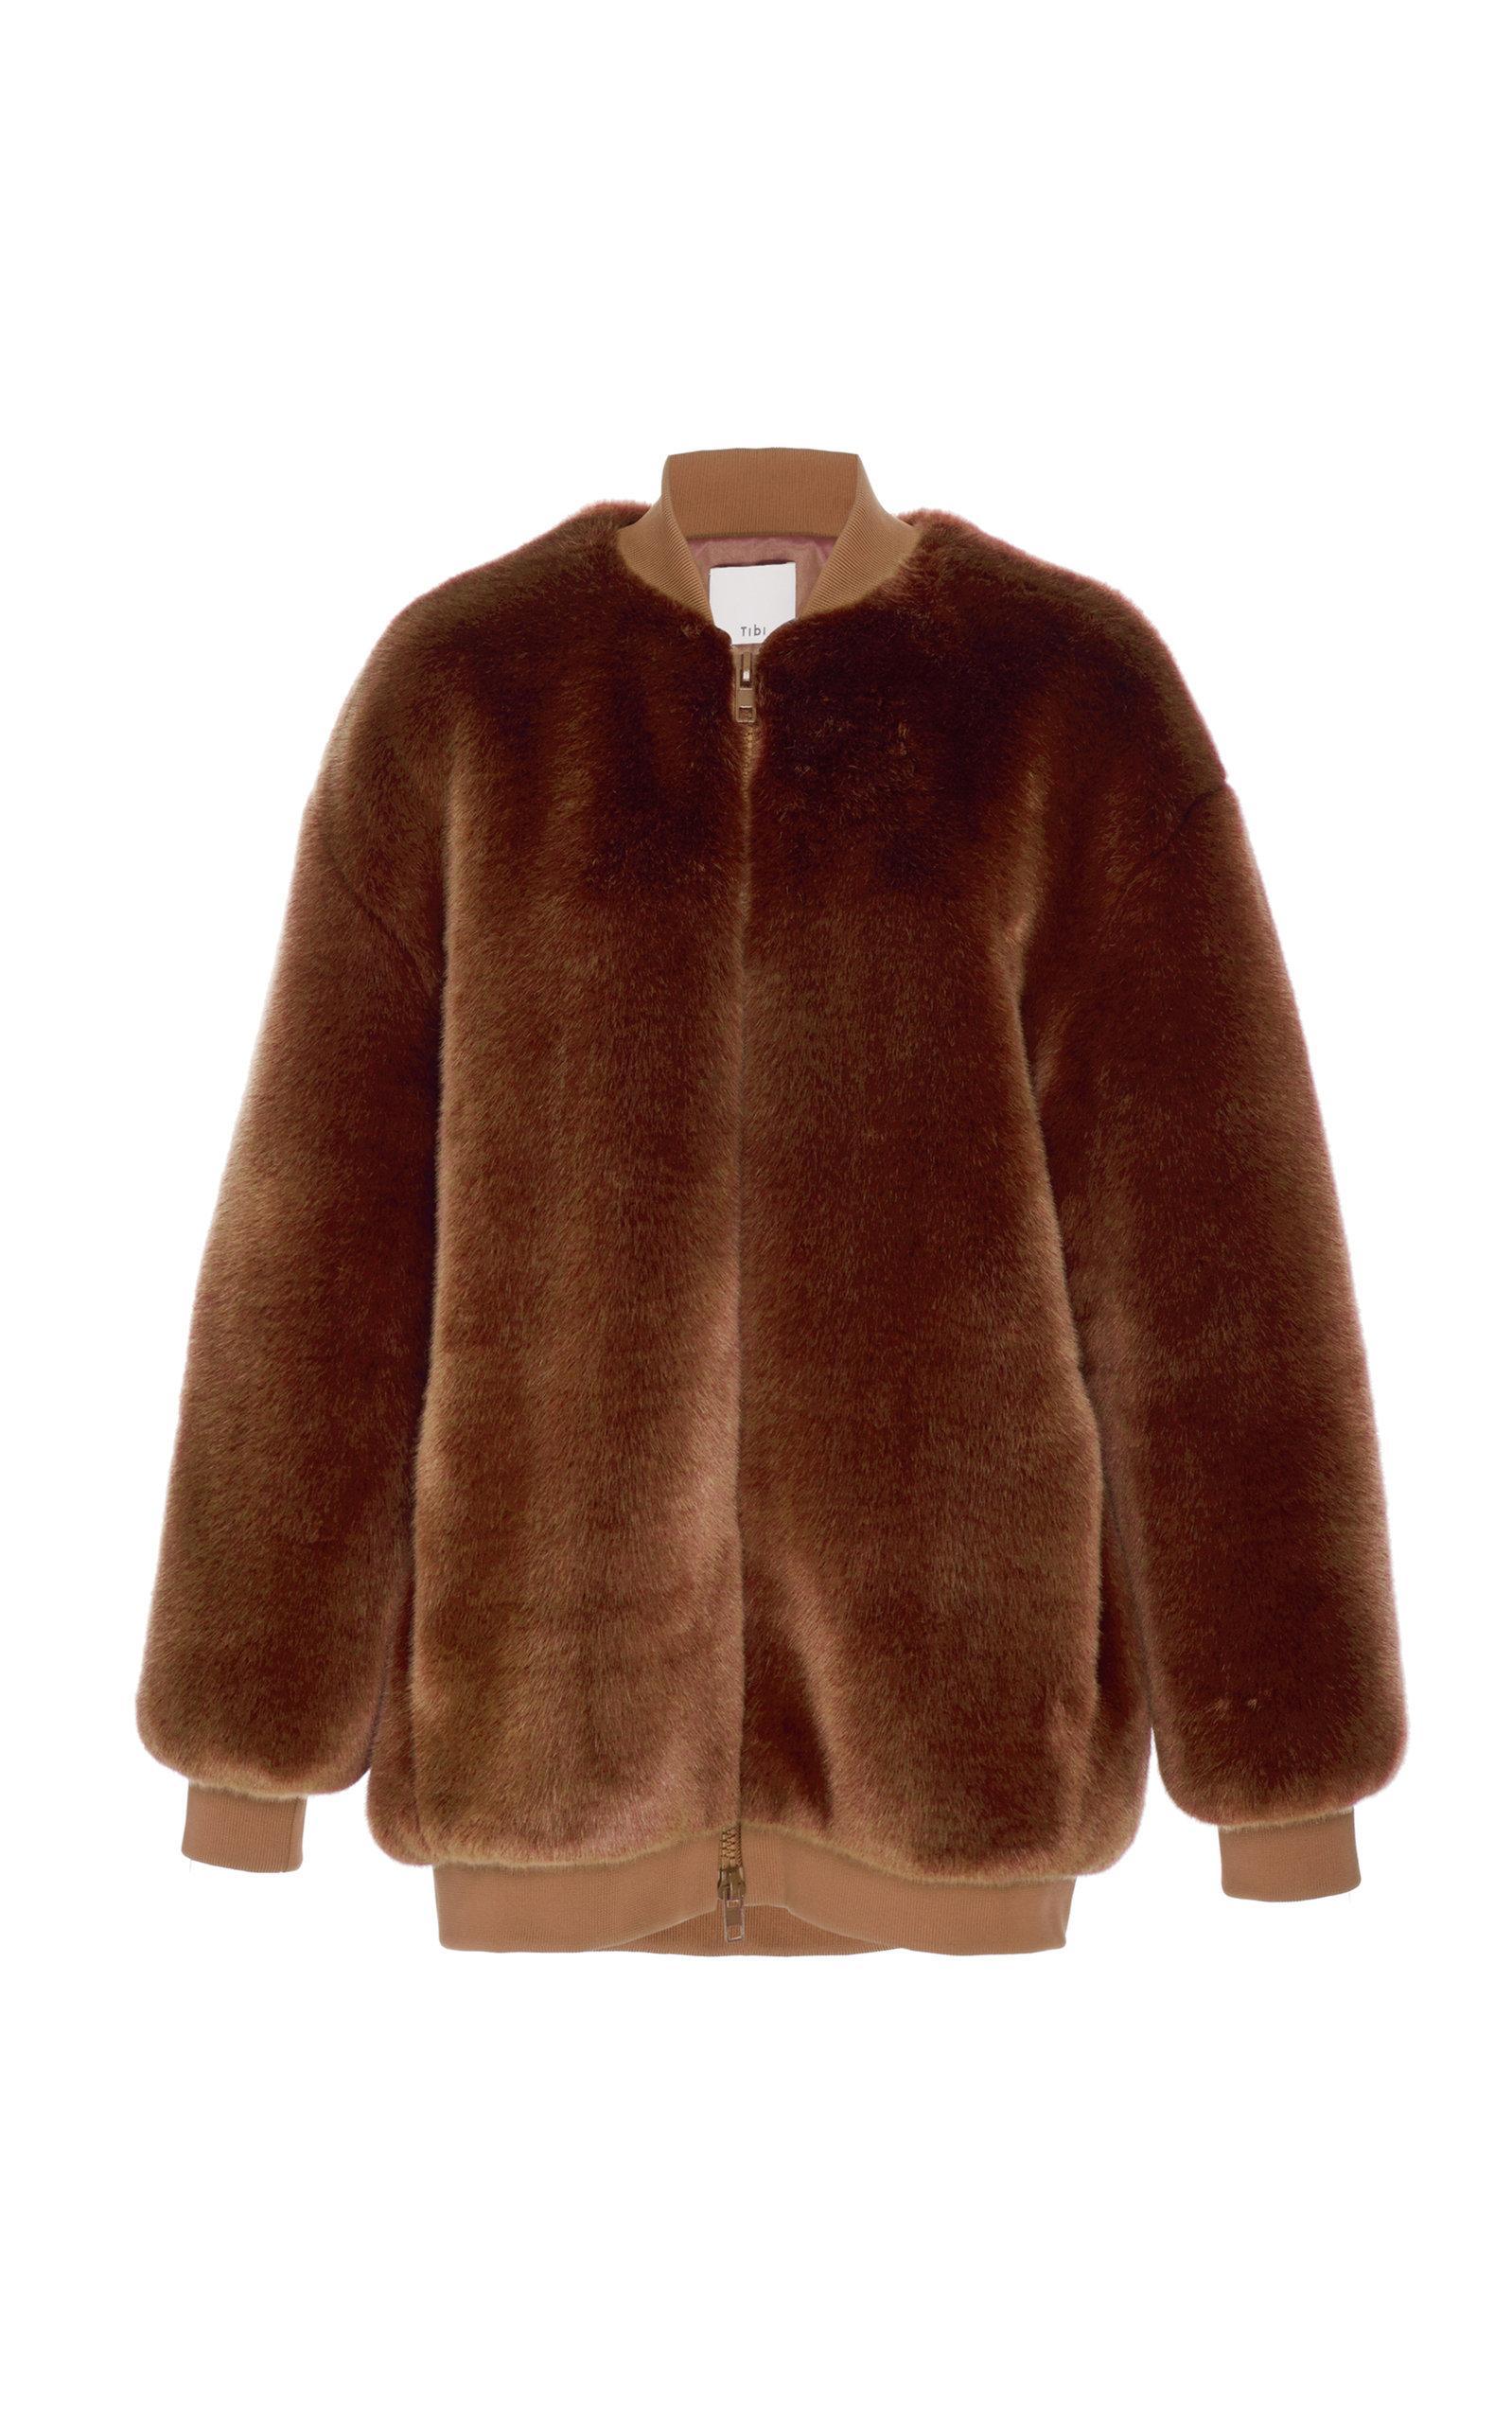 3ec4fff76e0d Lyst - Tibi Faux Fur Bomber Jacket in Brown